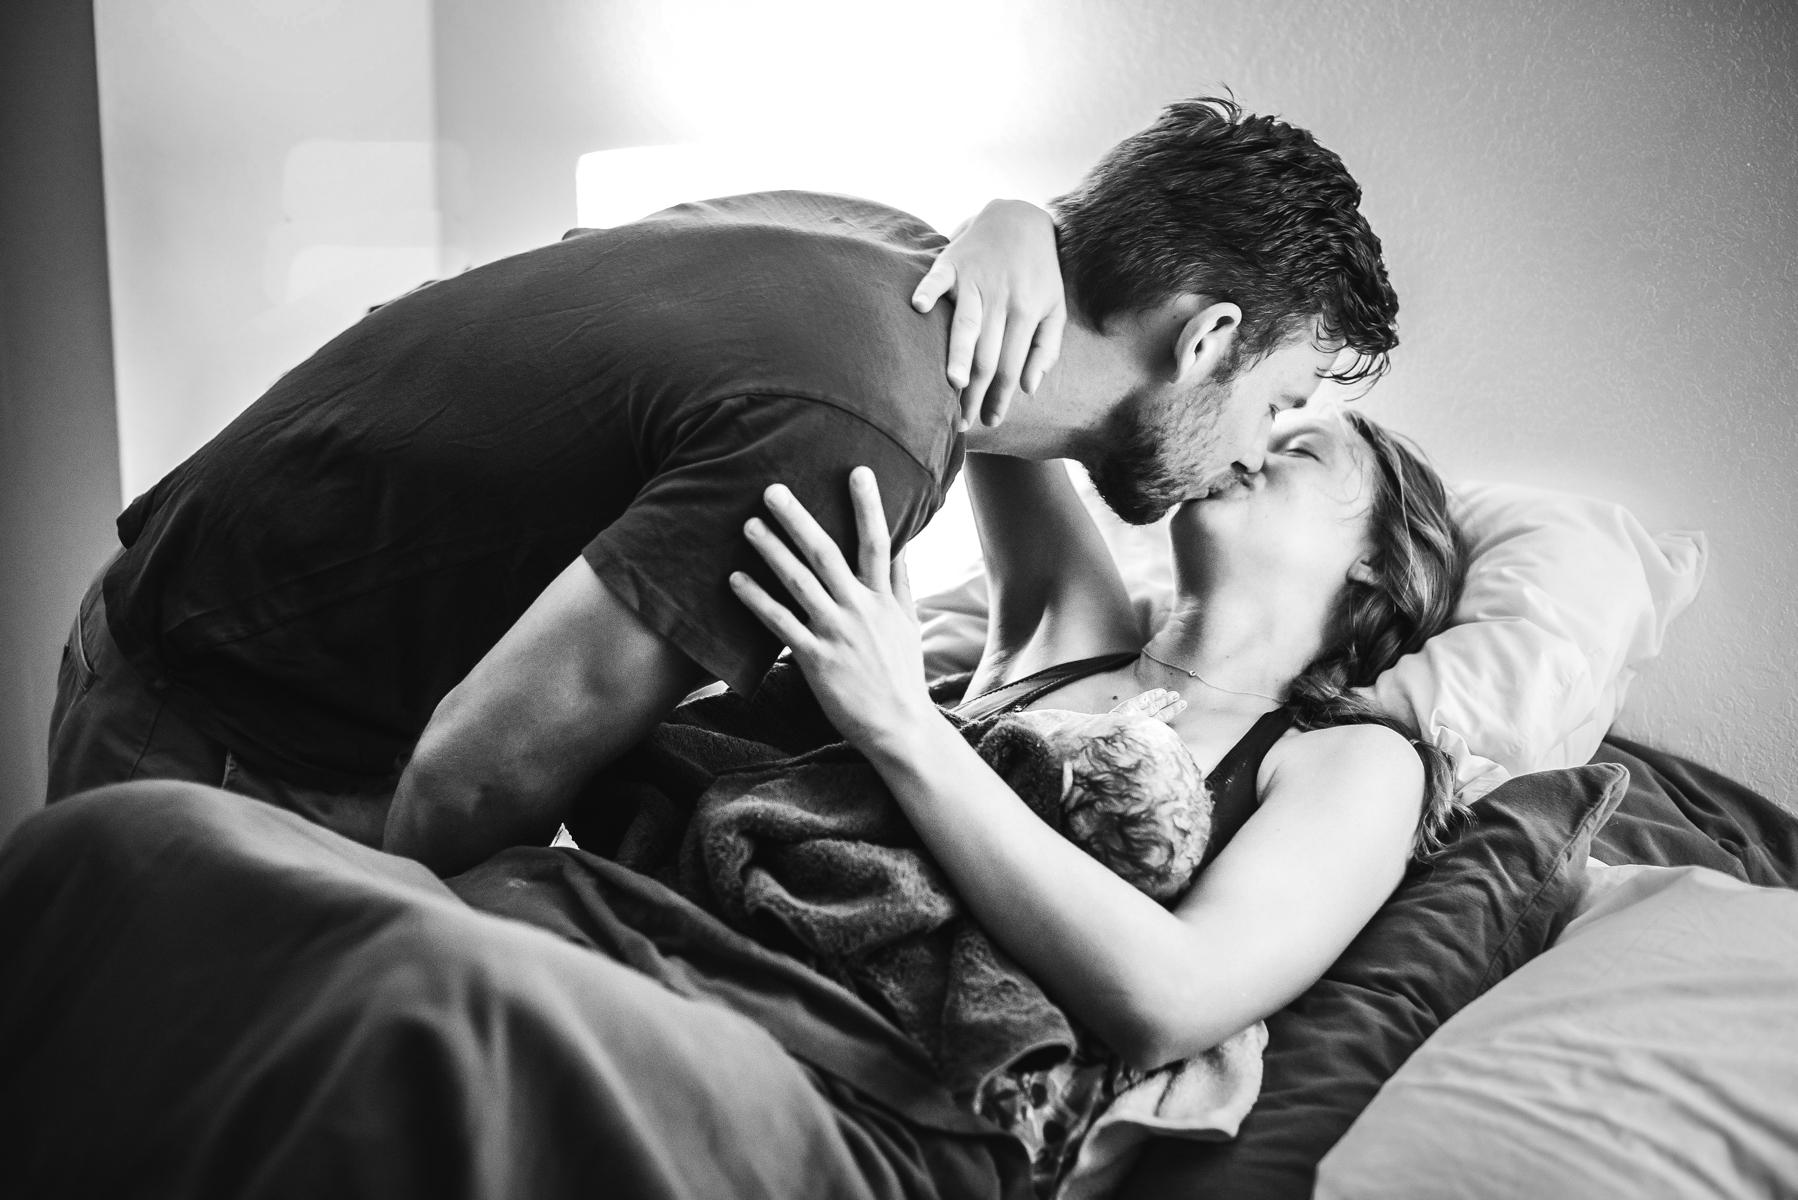 Colorado-springs-birth-photographer-home-birth-couple-embraces